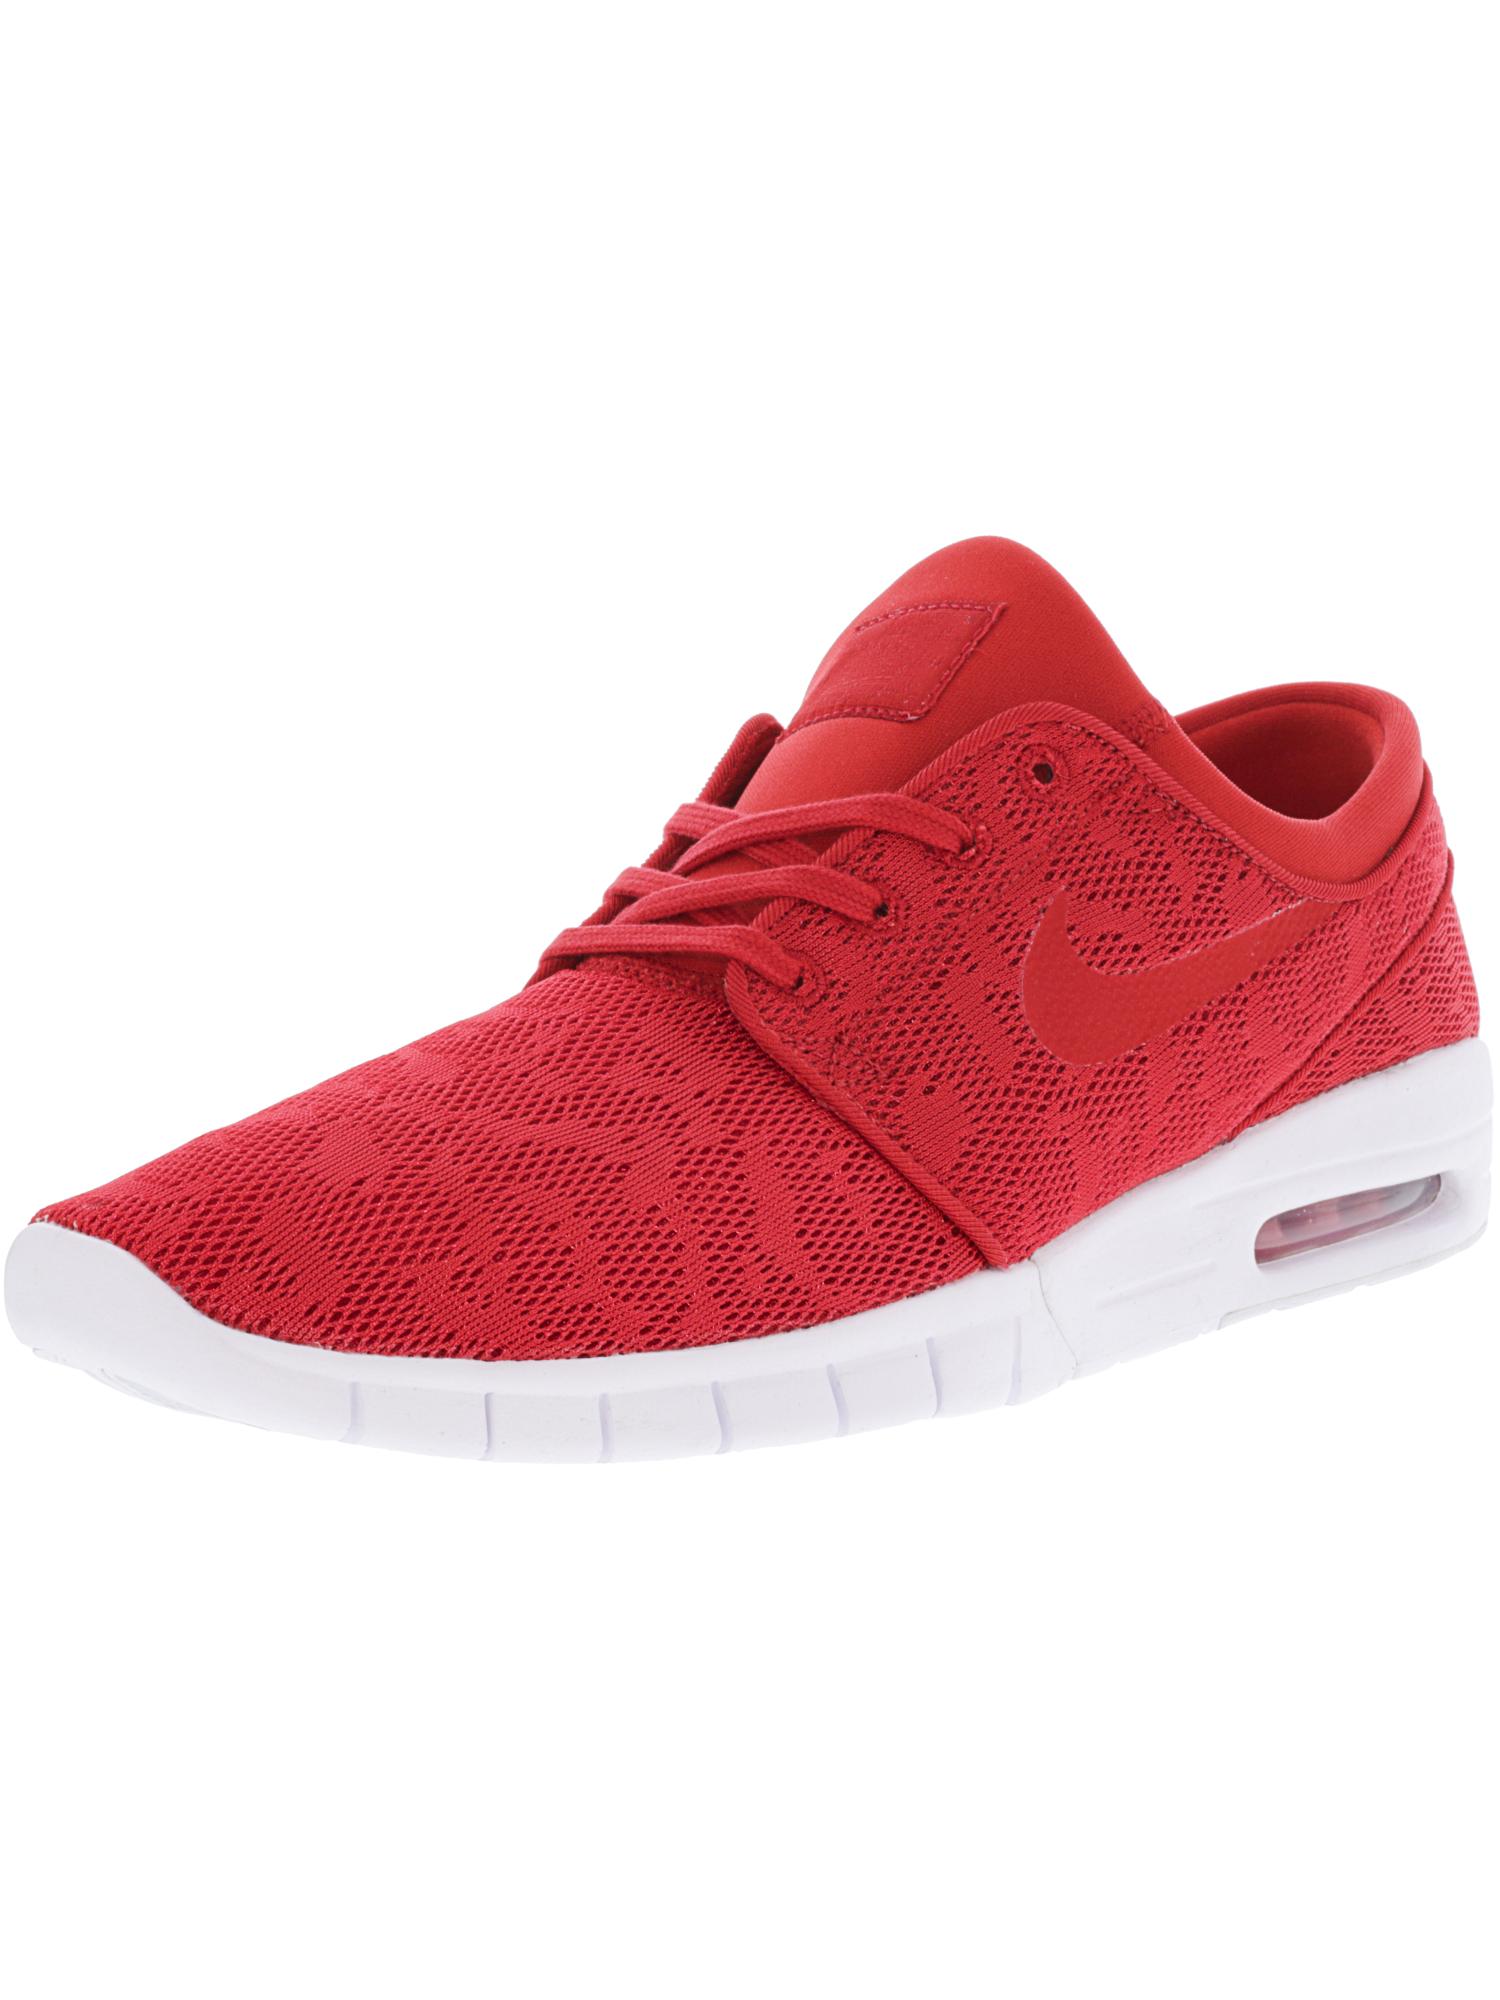 228df90701 ... spain mens nike sb stefan janoski max size 10 university red white  skate shoes 8c7c3 1698e